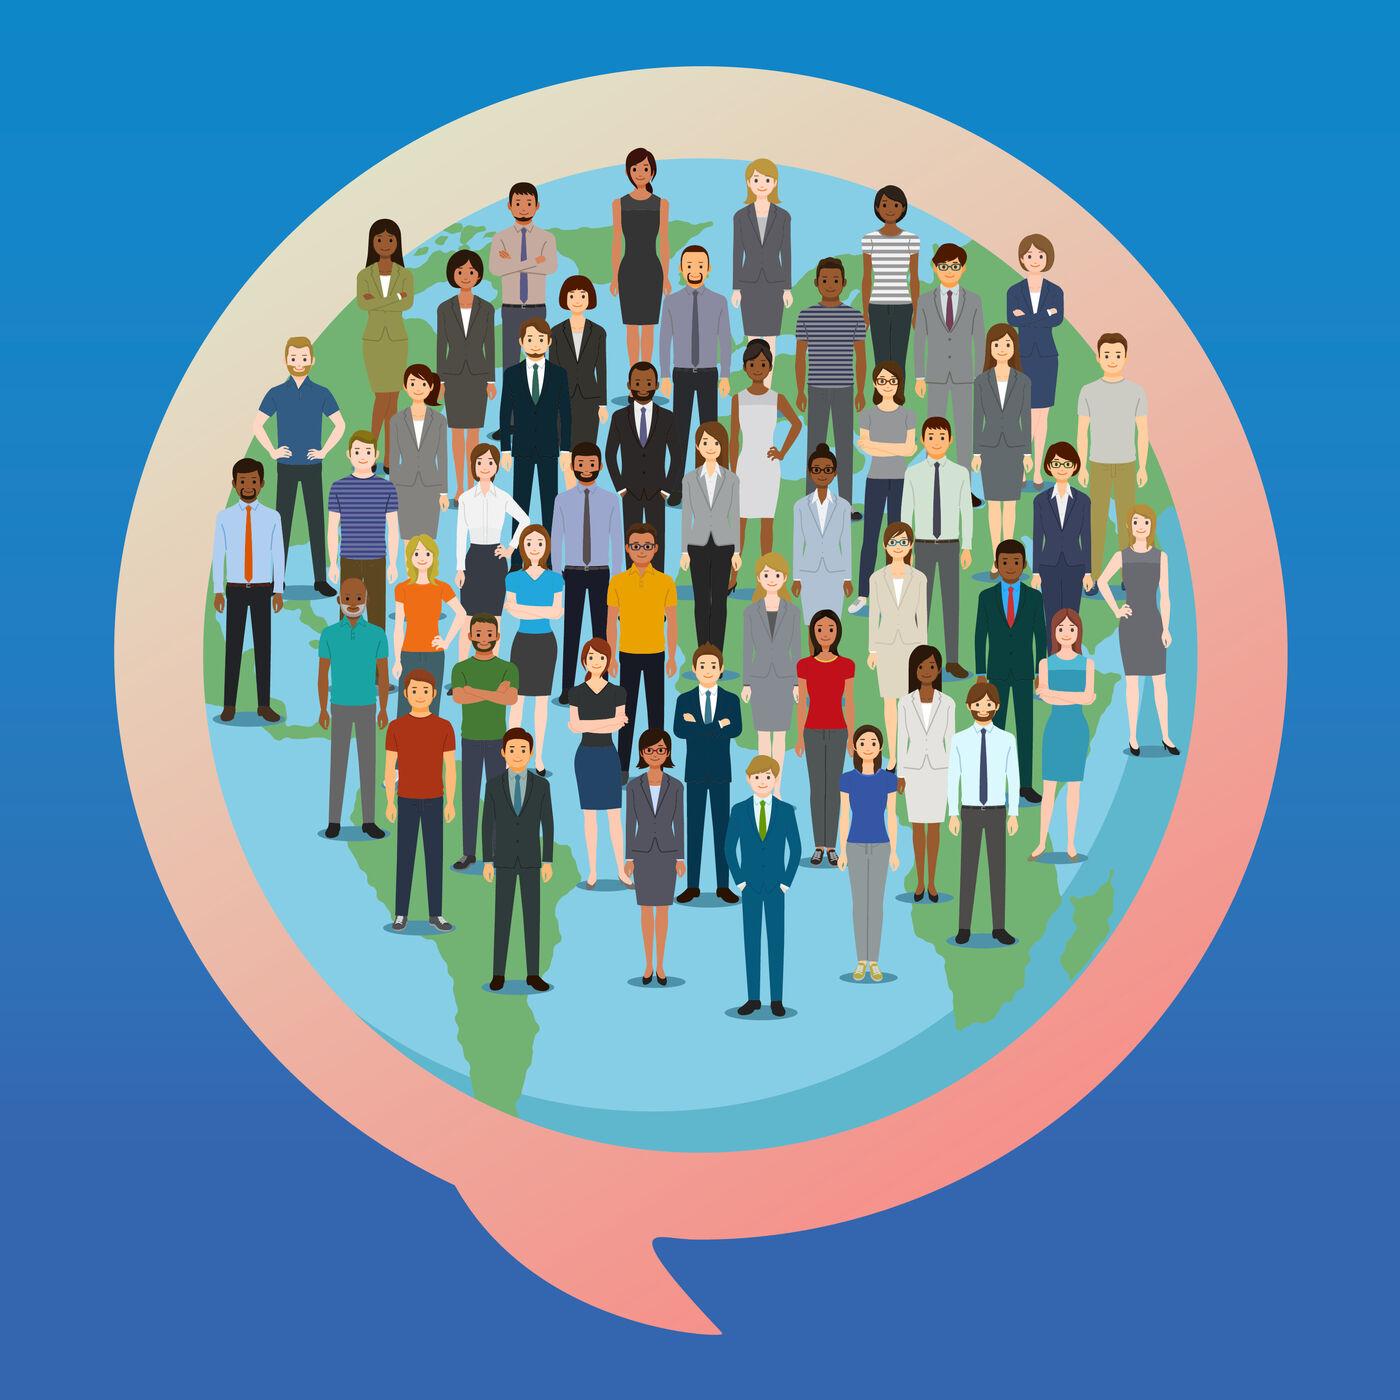 Kathleen McCudden on the job market and Seek's guiding principles